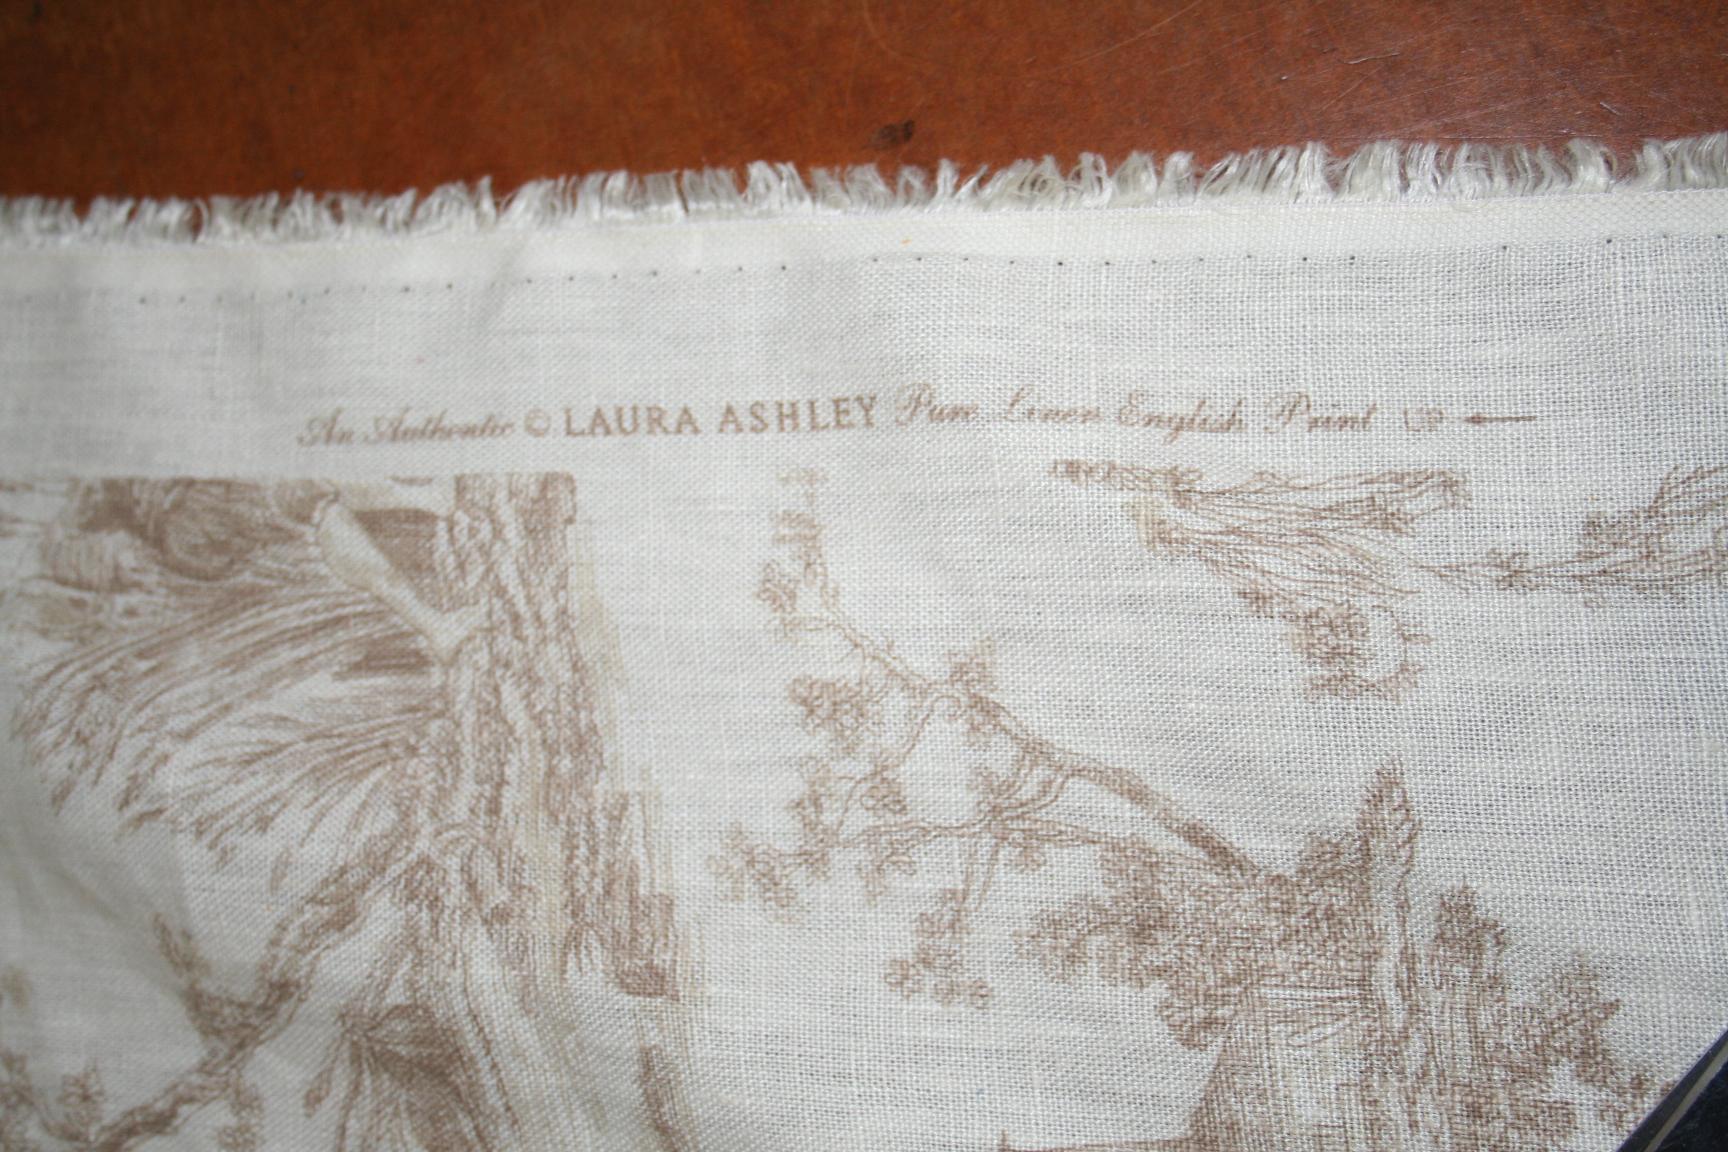 Laura Ashley Pastimes Willow Linen Color114 Toile Portfolio Fabrics